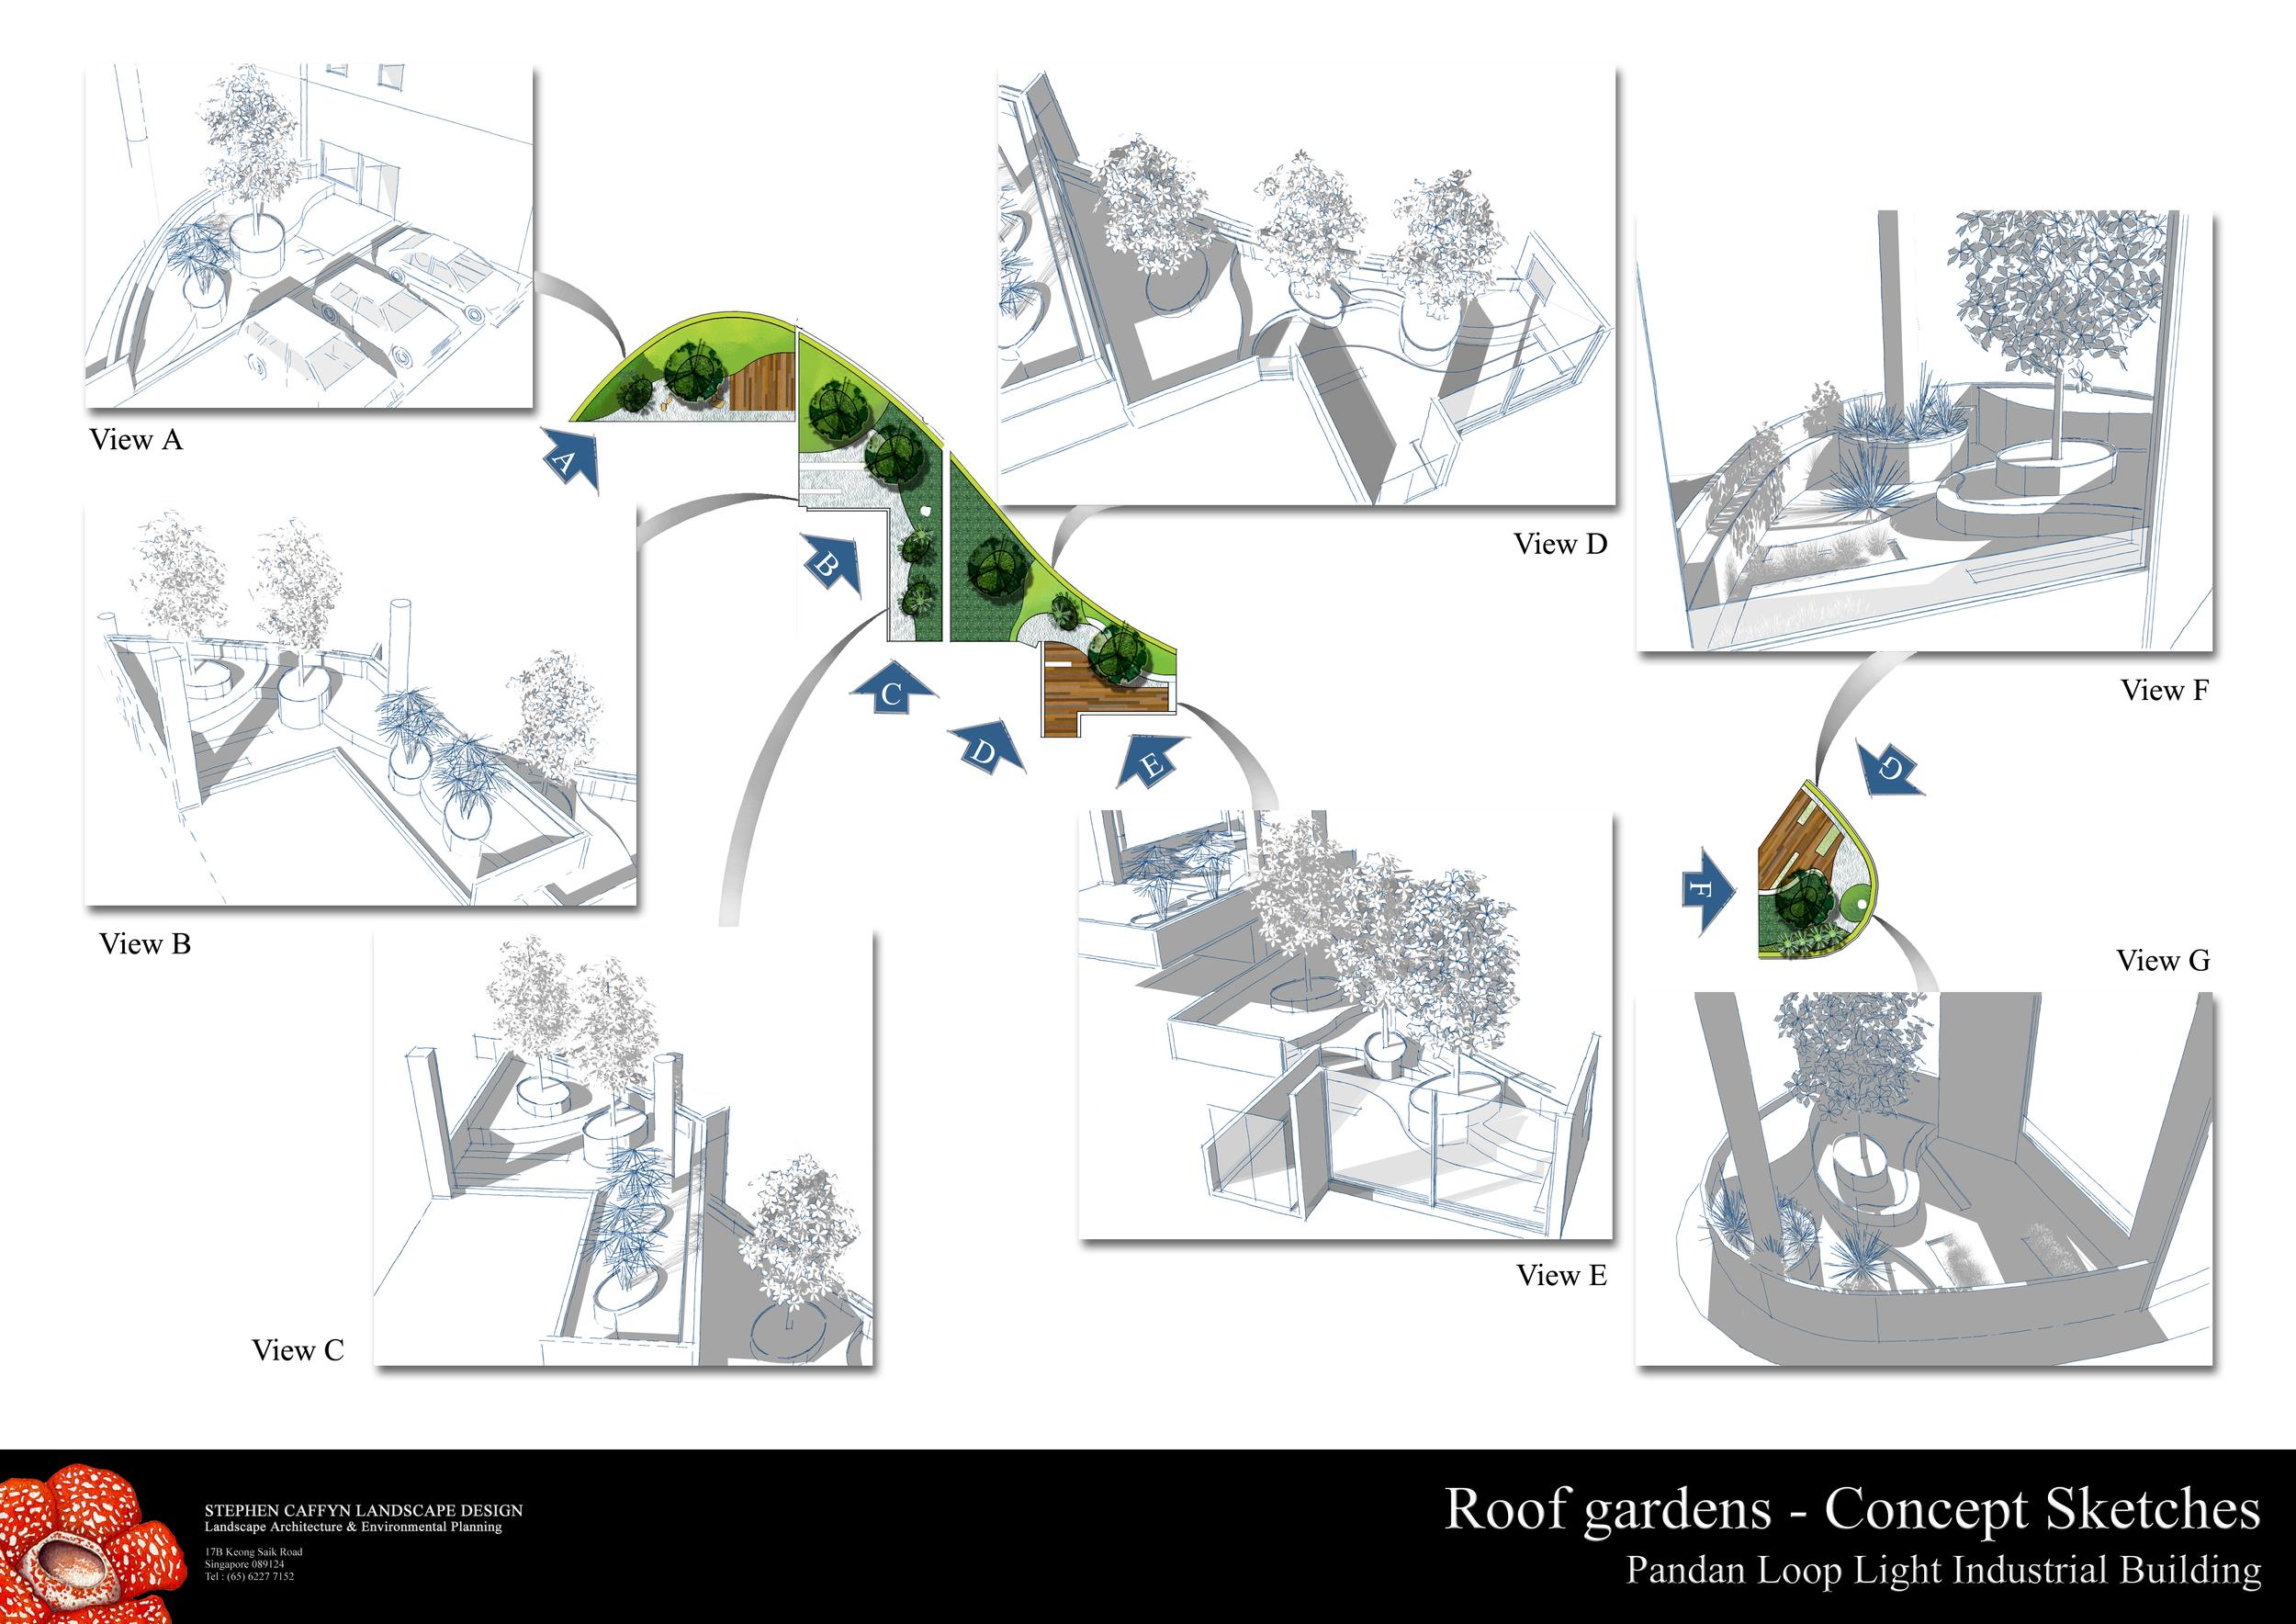 4 Pandan Loop LIB Presentation Plan 3 Roof Garden sketches A3_Chia Ling.jpg